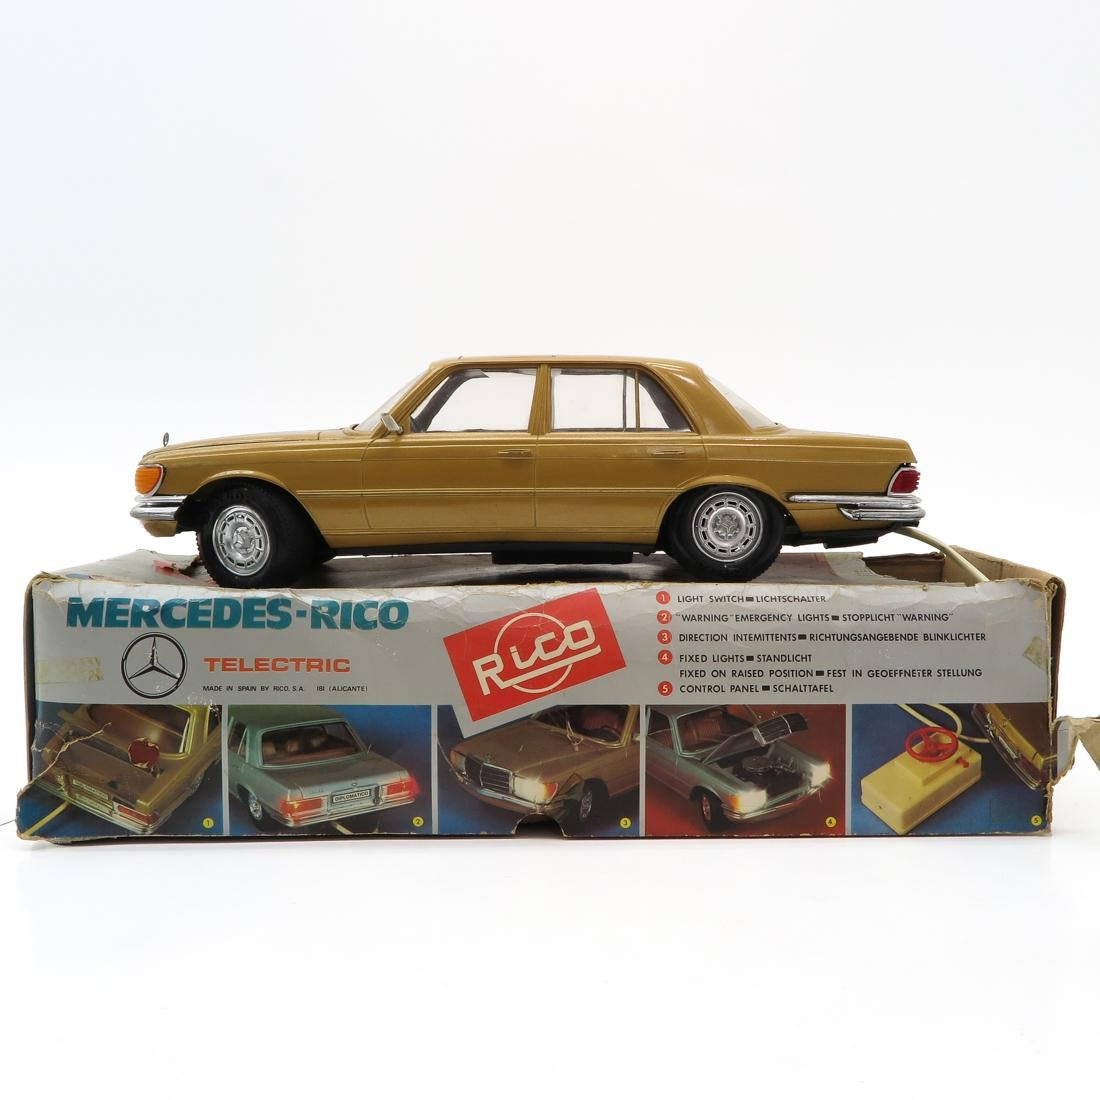 Vintage Rico Mercedes Benz Toy Car in Box